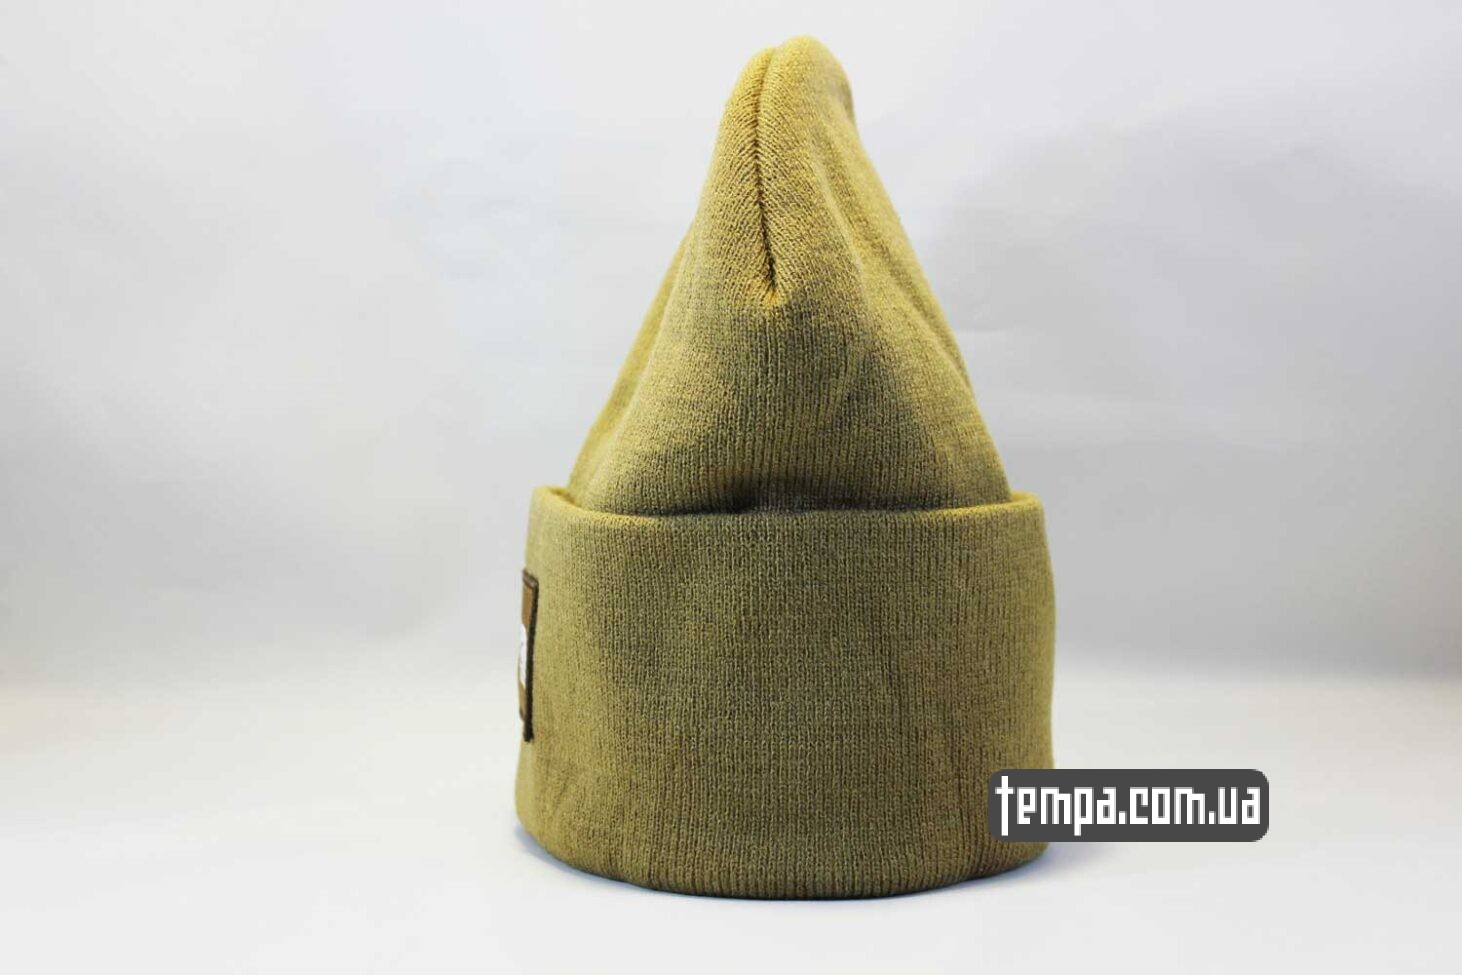 оригинал одежда шапка beanie North Face желтая Норс Фейс Украина